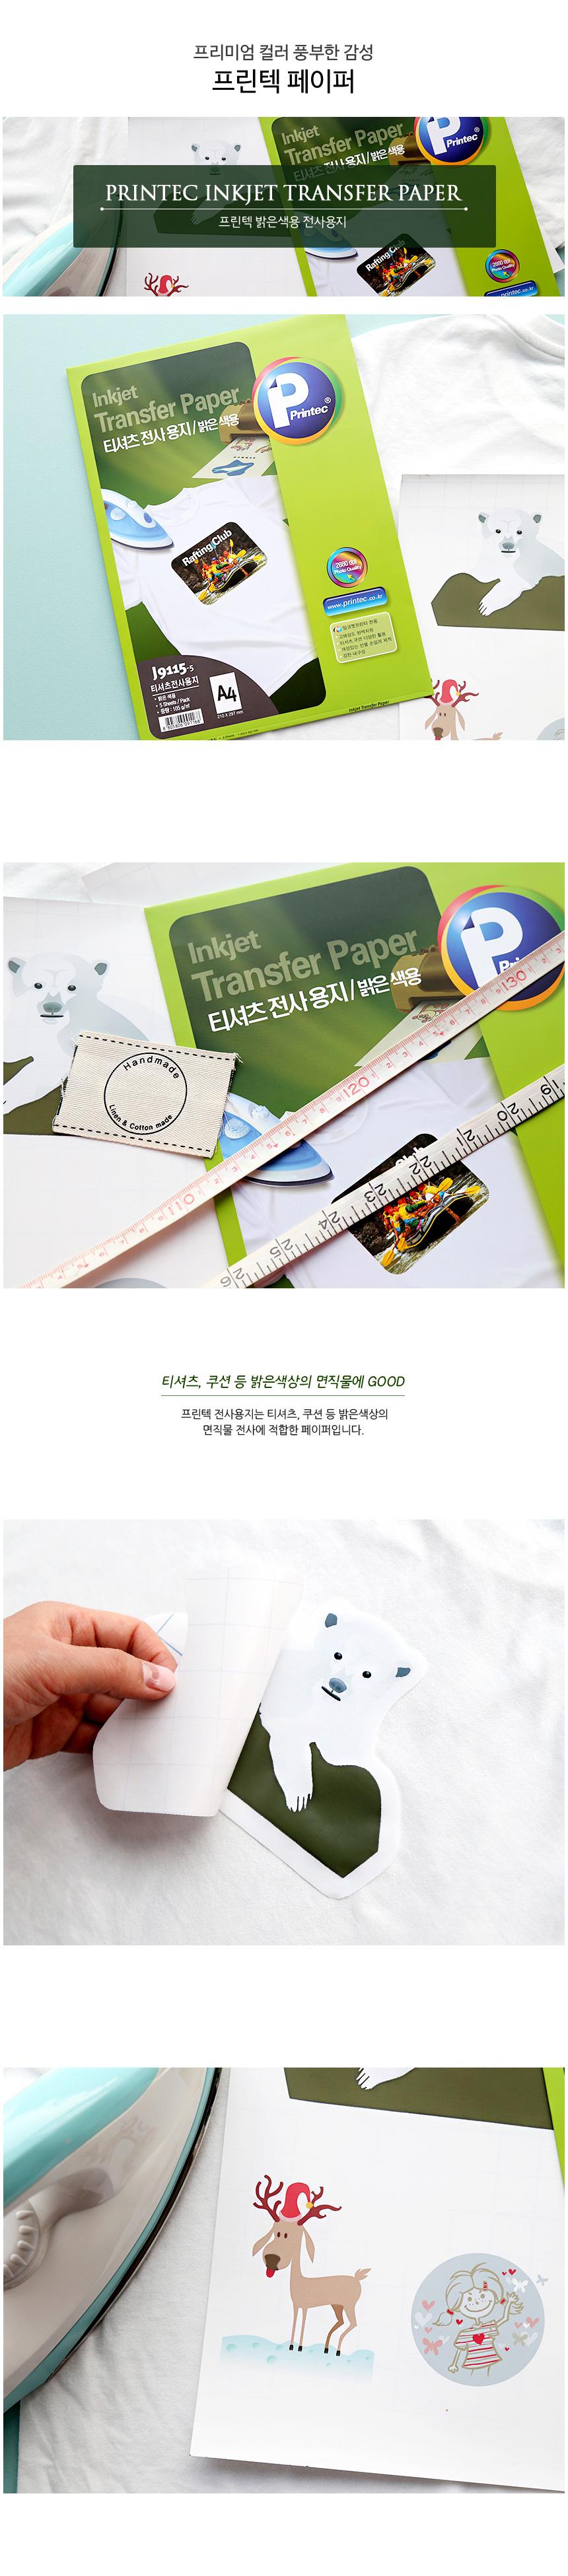 printec_a4_inkjet_transfer_paper_j9115-5_01.jpg